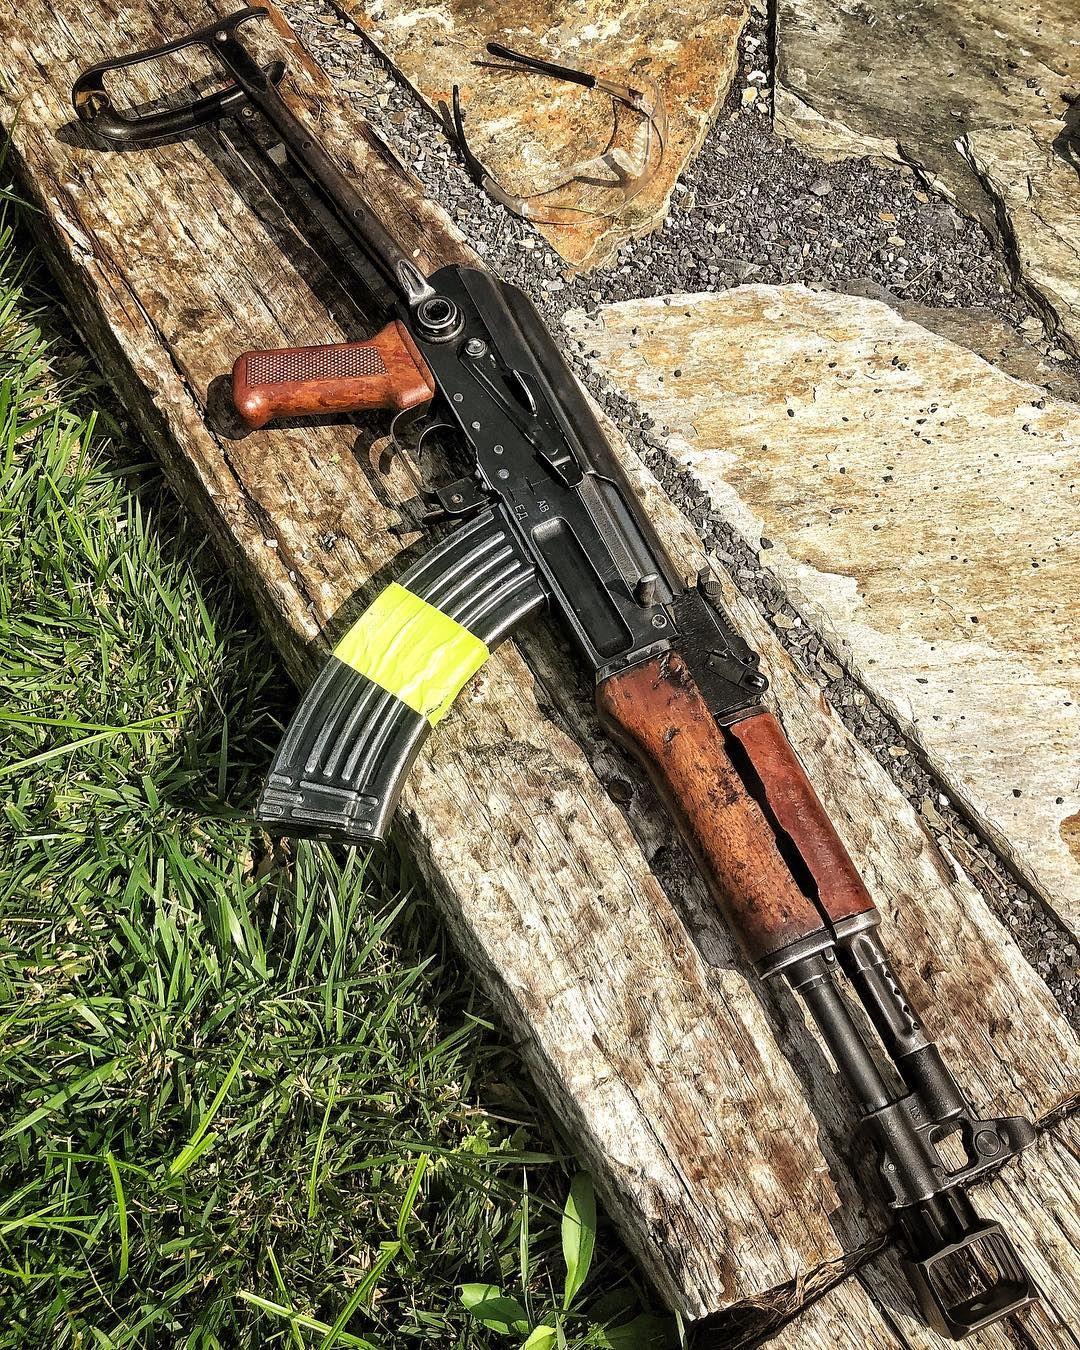 Pin by Derek Culver on AK-47 Rifles & SBR's | Guns, Tactical